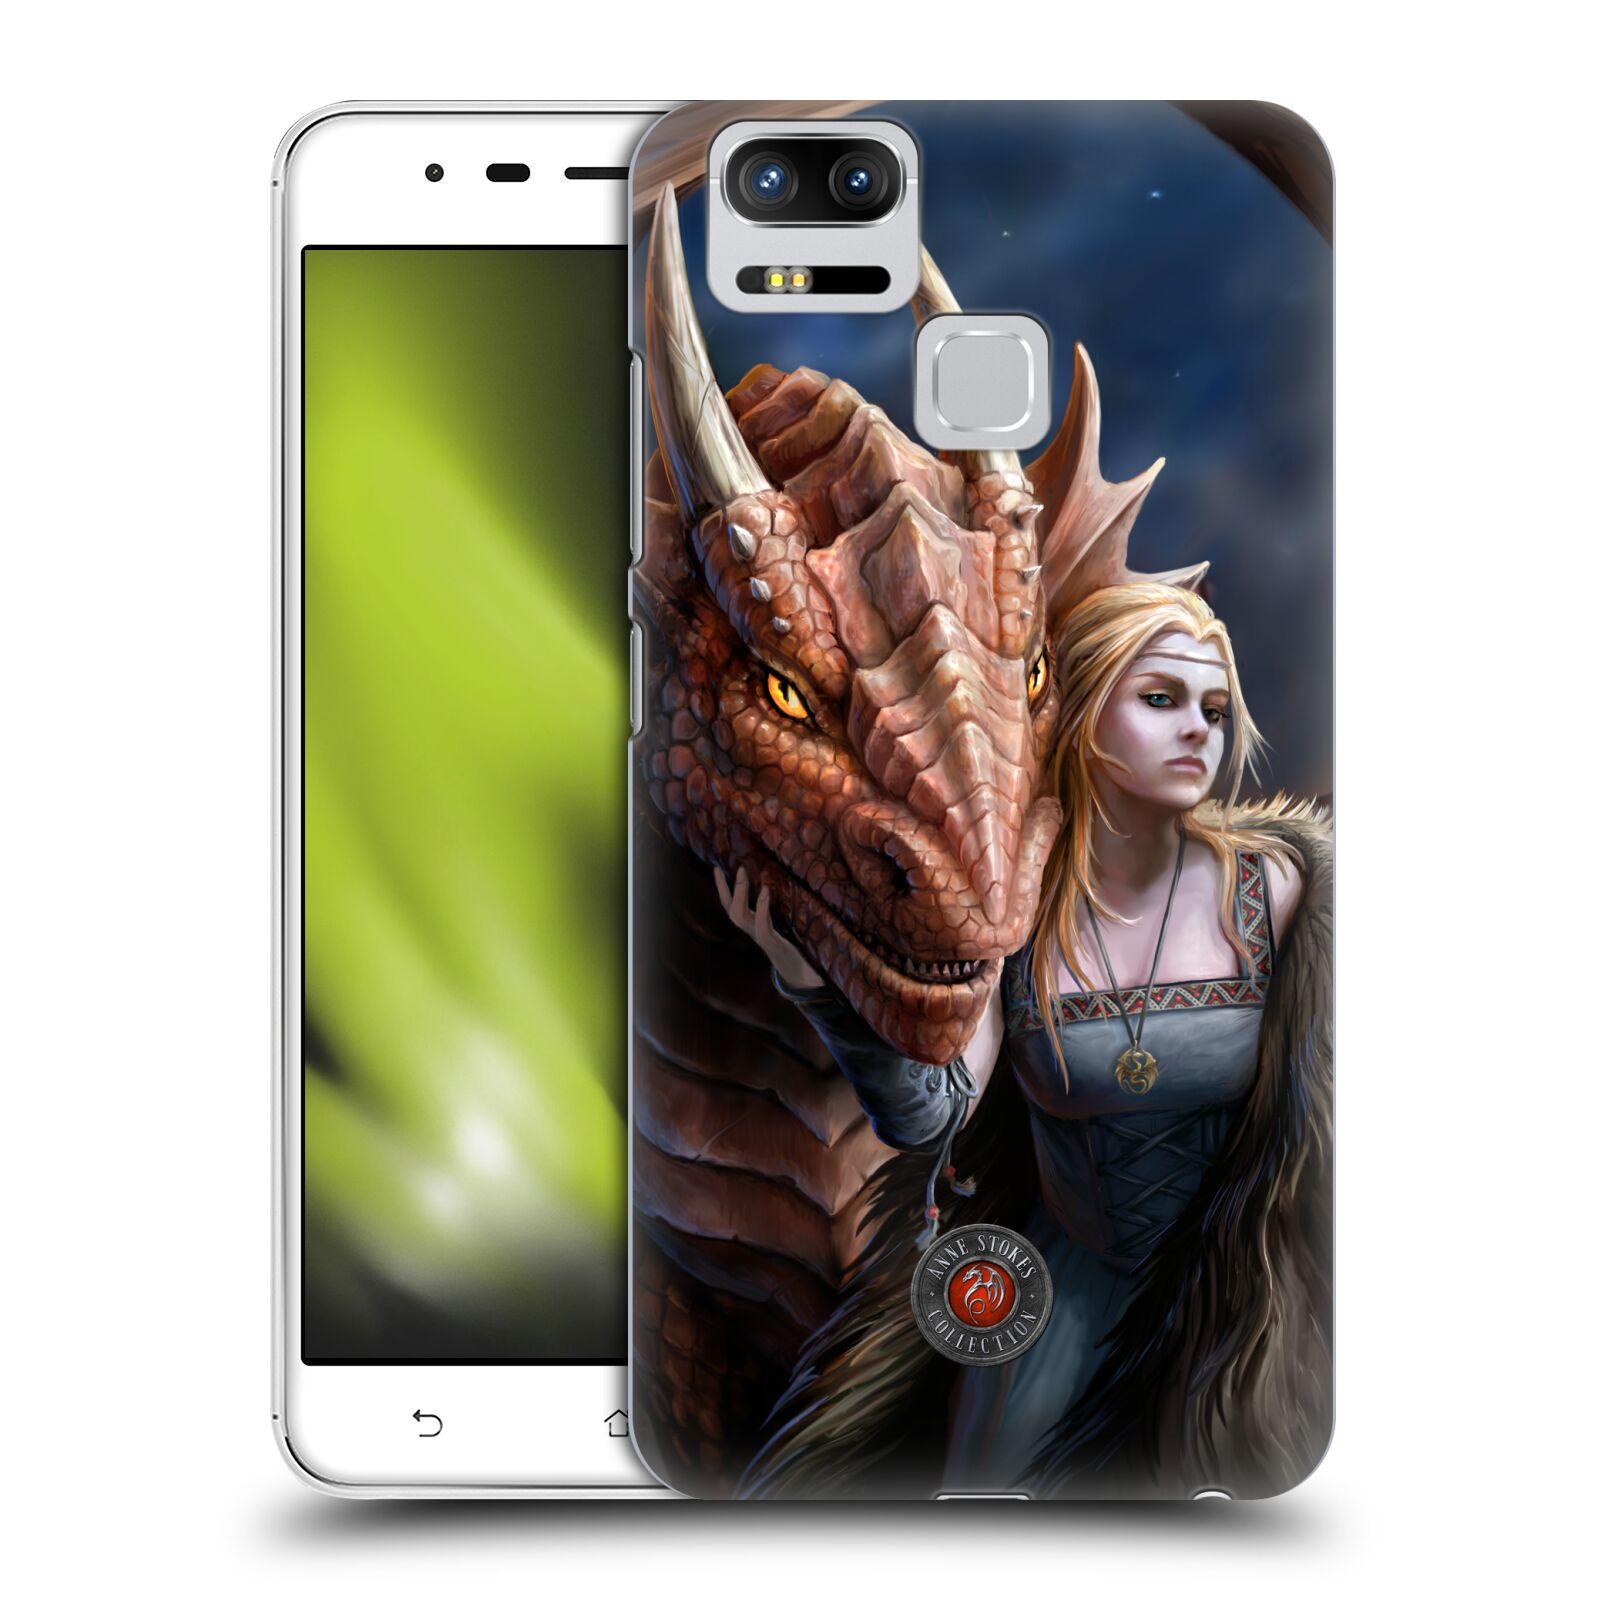 Oficial-Anne-Stokes-Dragon-amistad-2-funda-rigida-posterior-para-Asus-ZenFone-telefonos